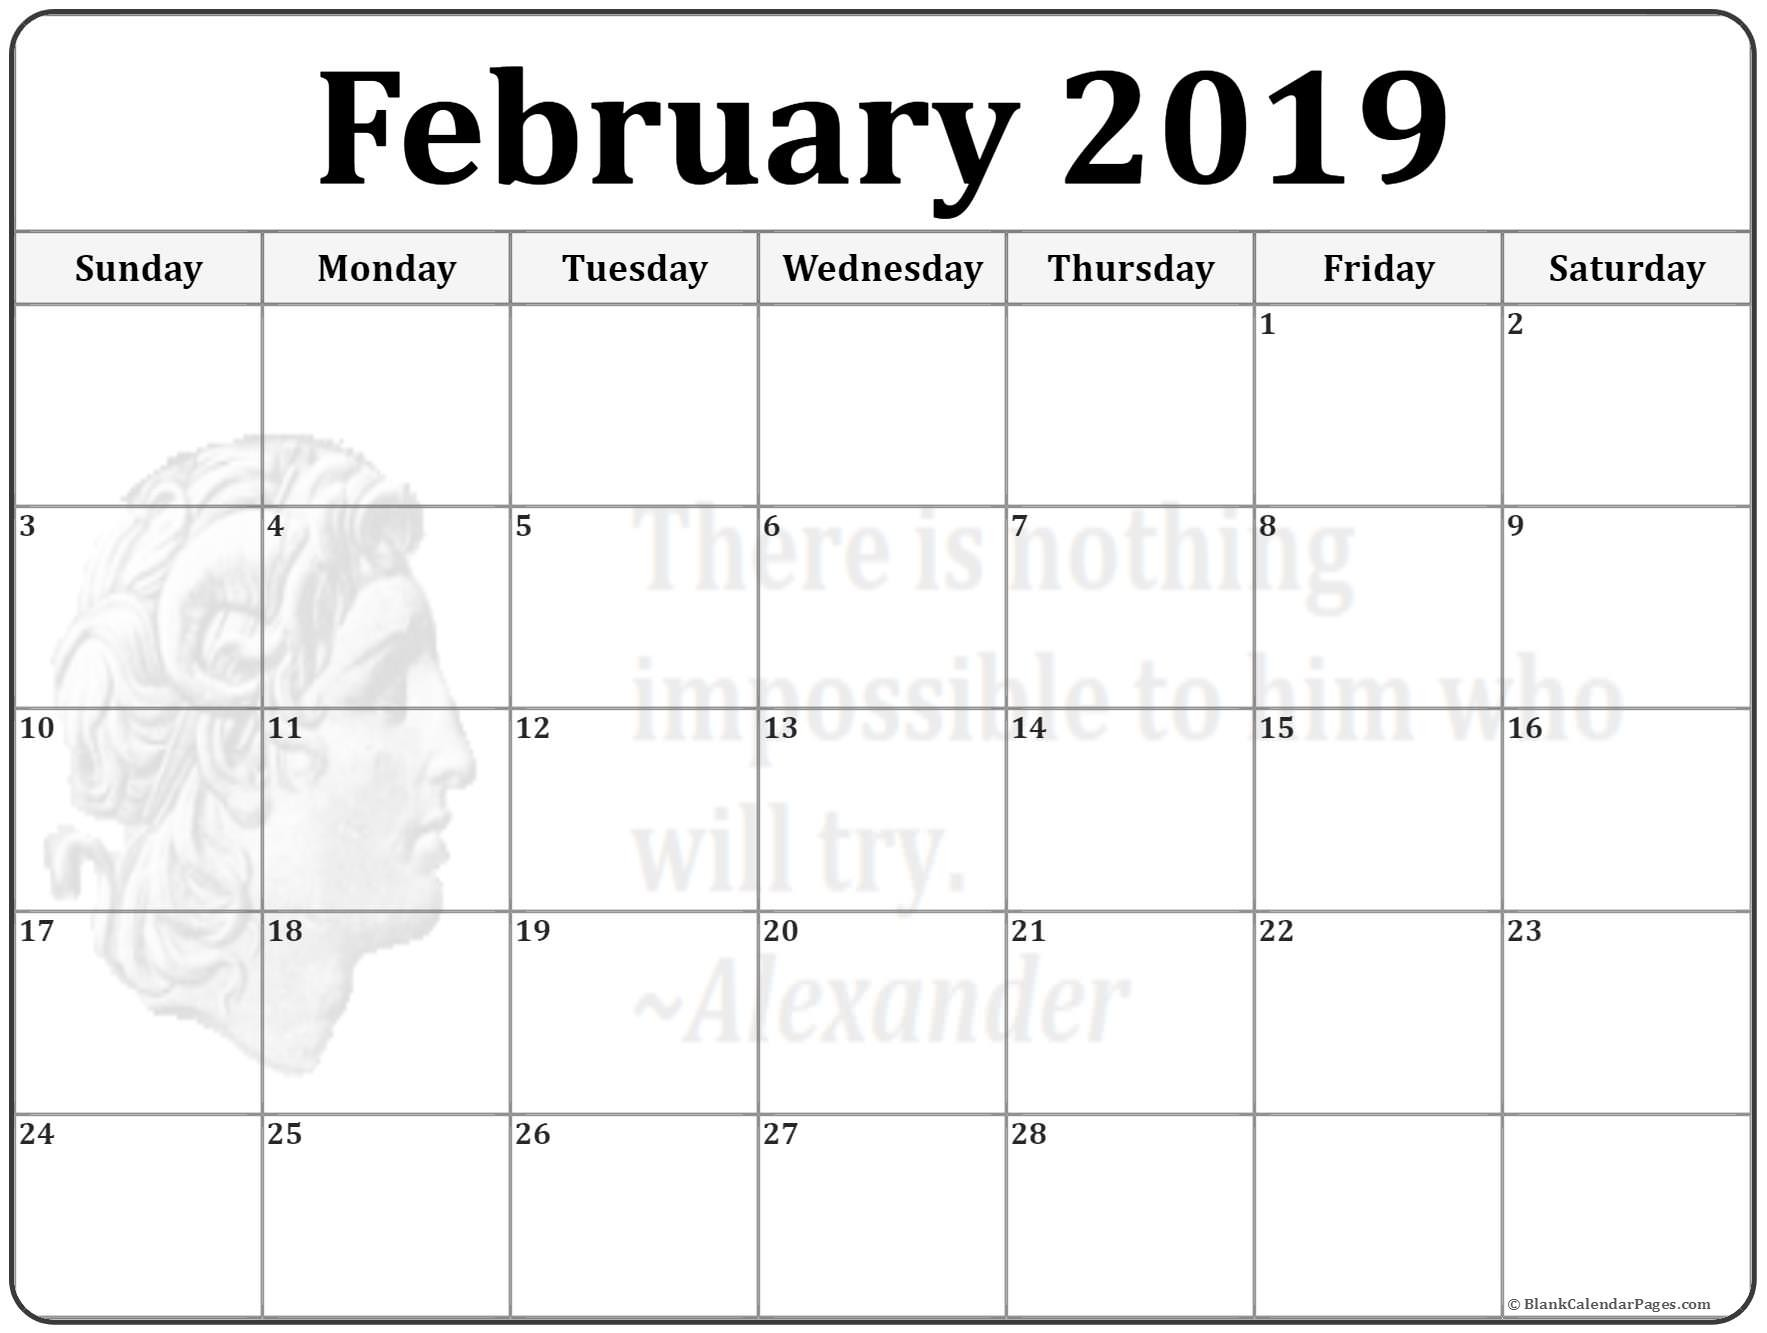 Printable 2019 Monthly Calendars February 2019 calendar